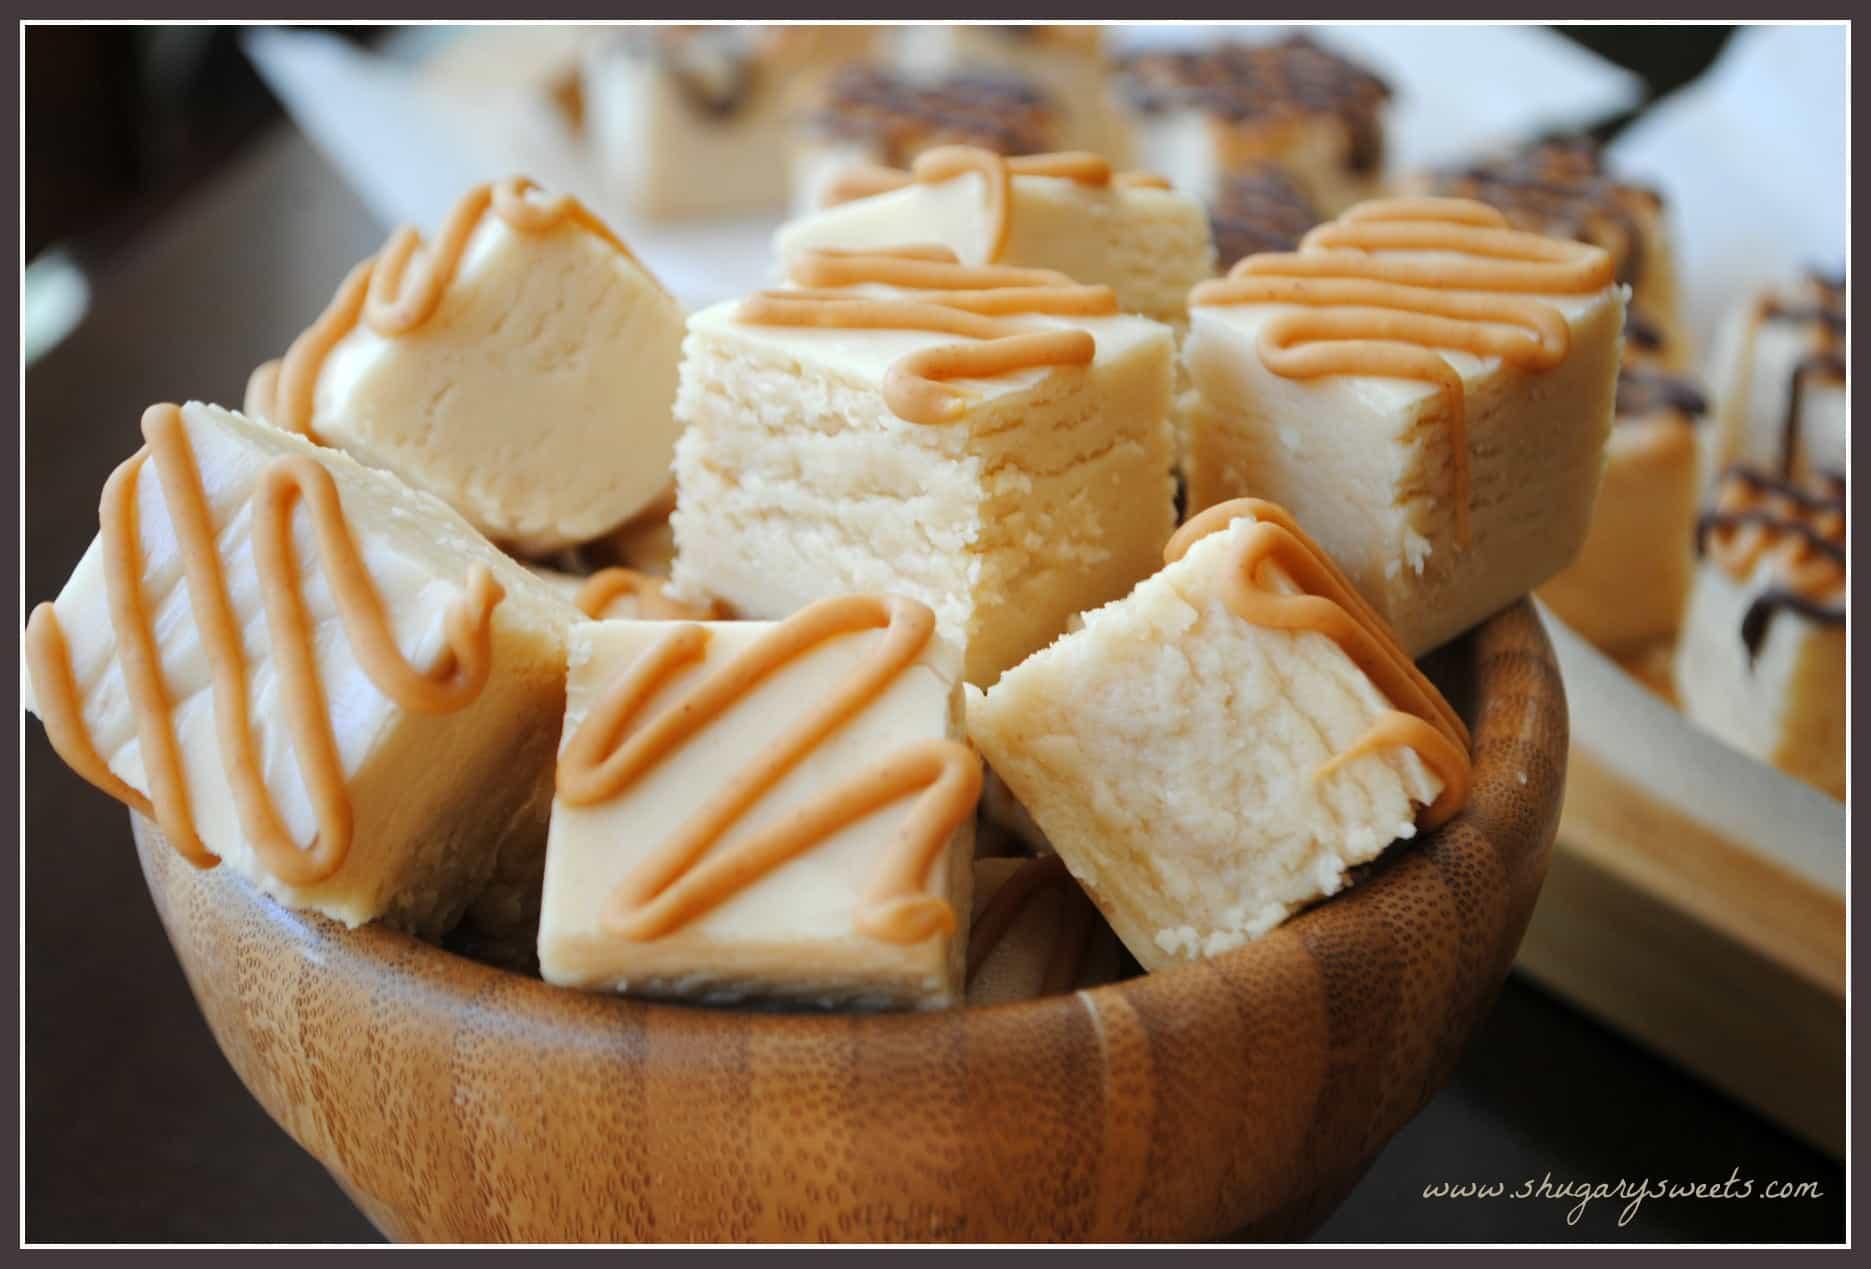 Peanut Butter And Chocolate Fudge Balls